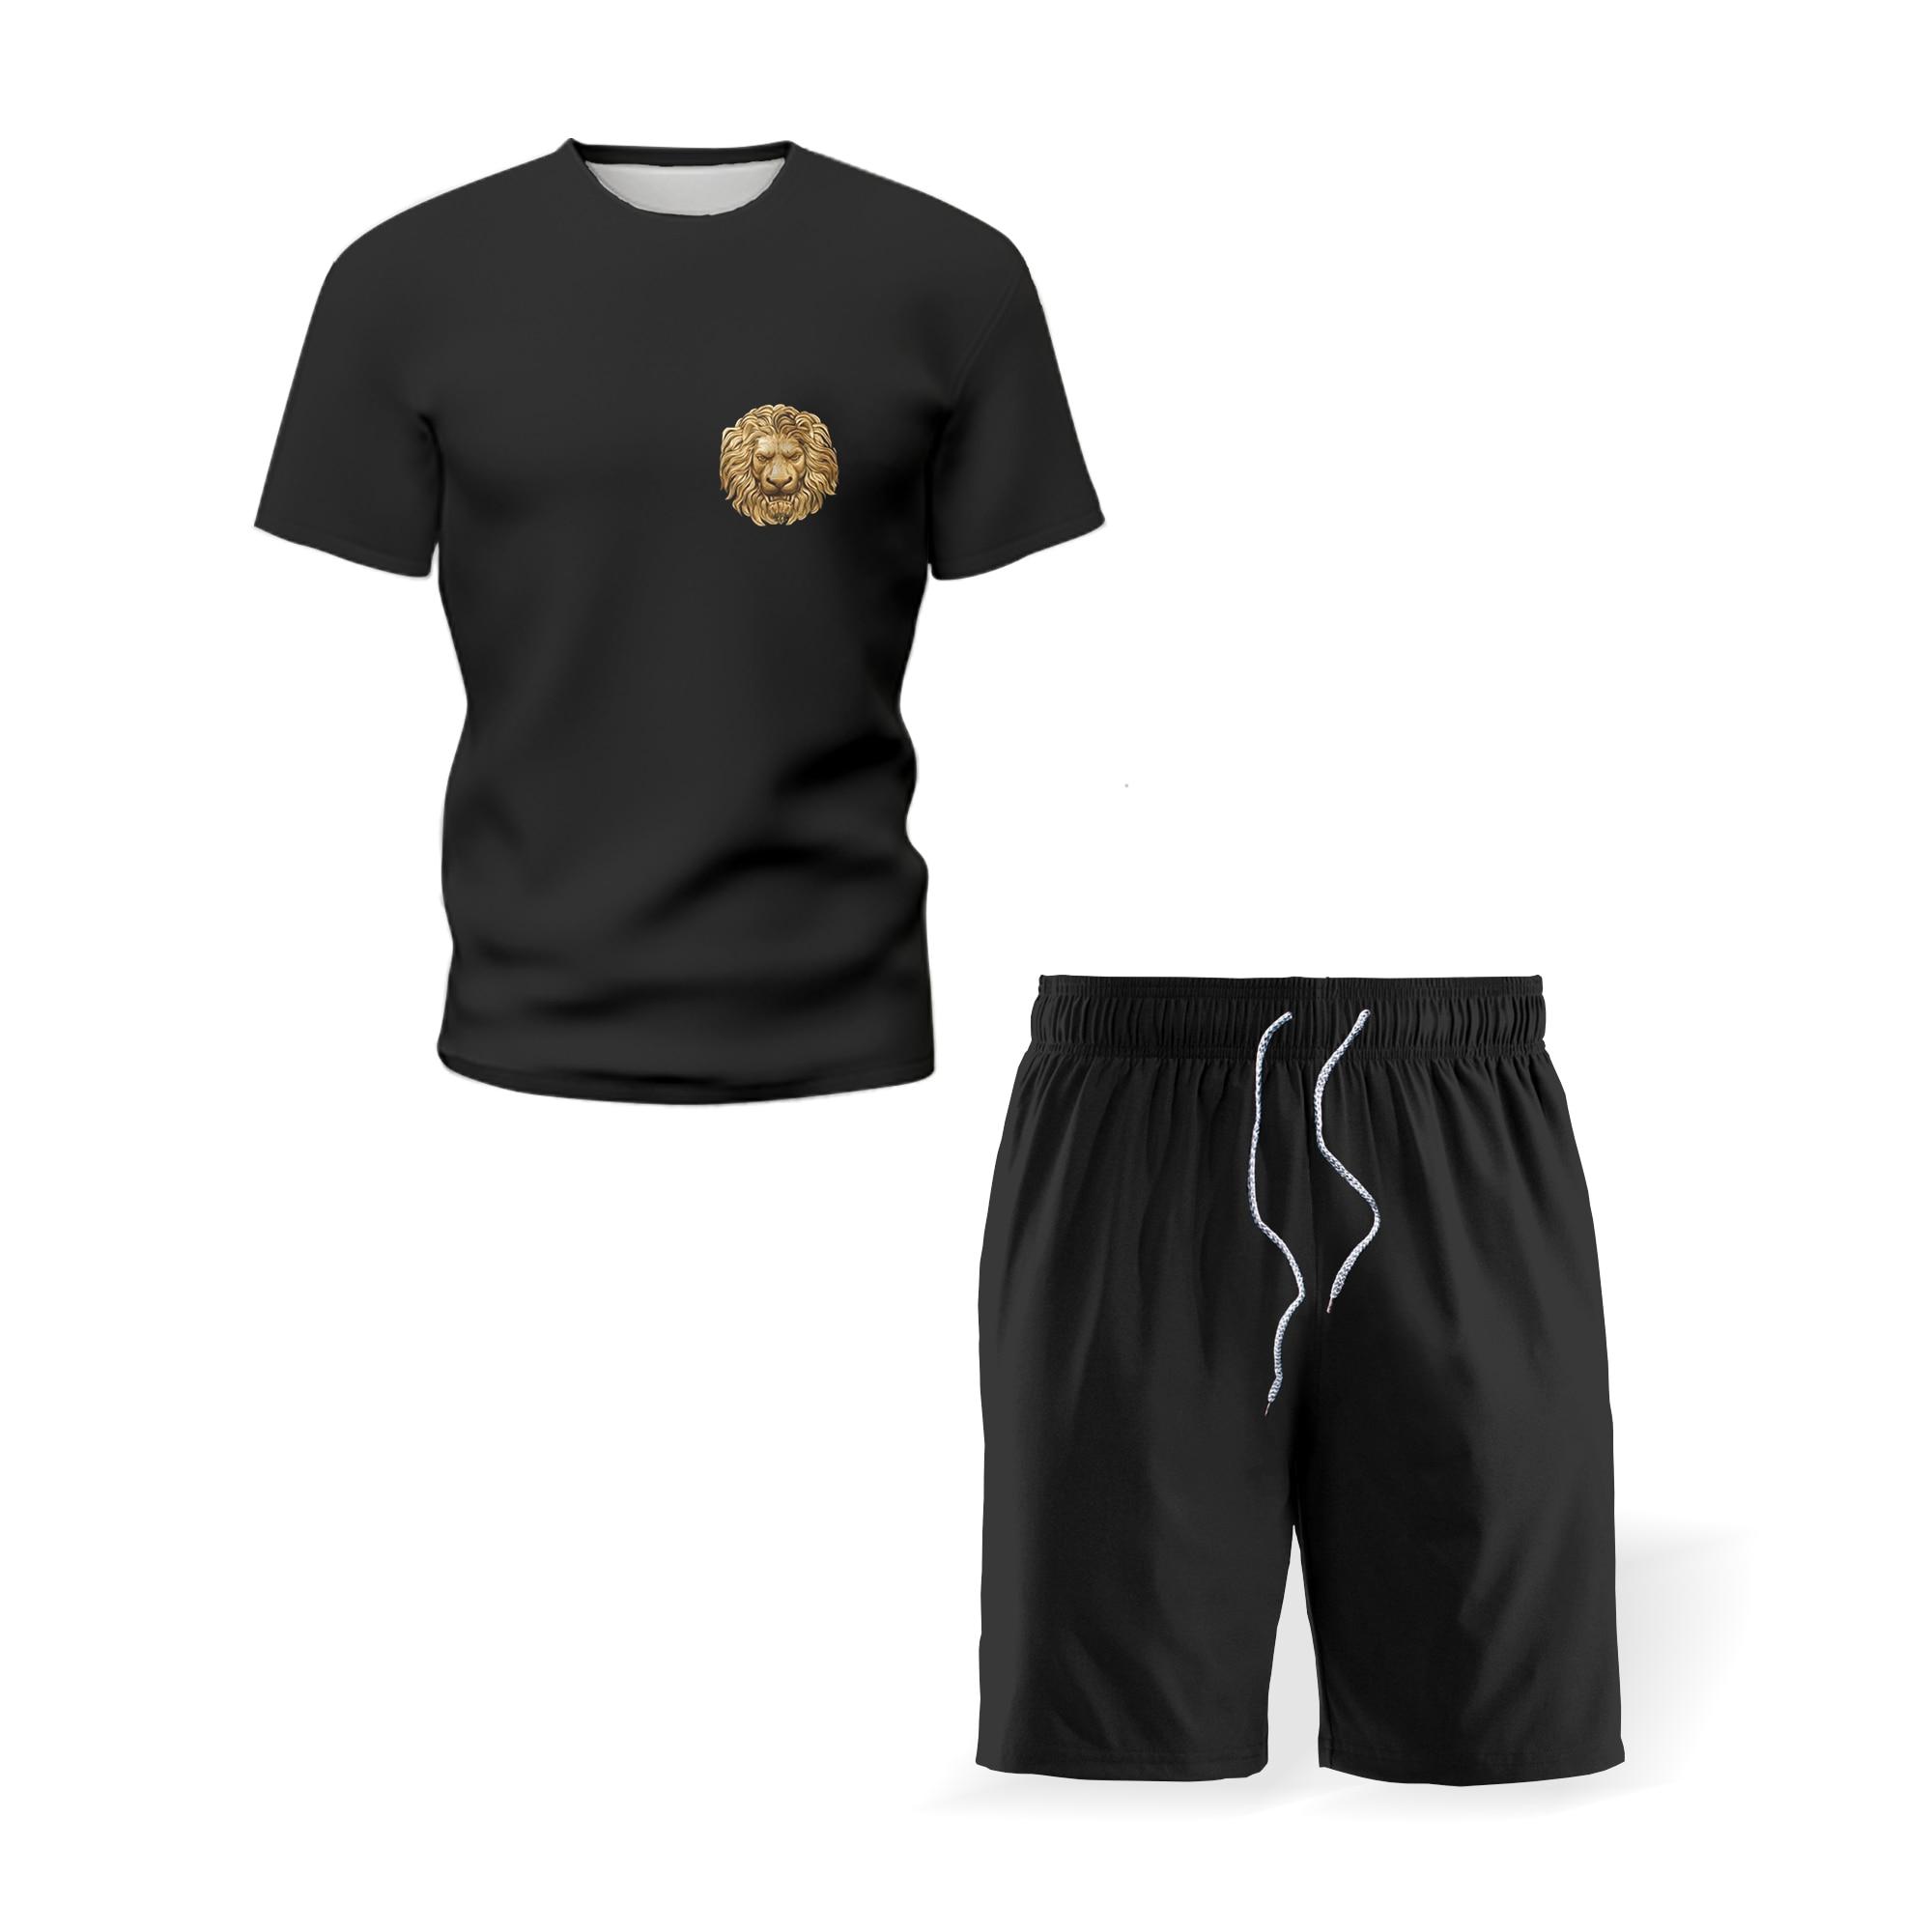 New black men's simple suit digital printing sportswear short-sleeved shorts loose men's basketball football training suit